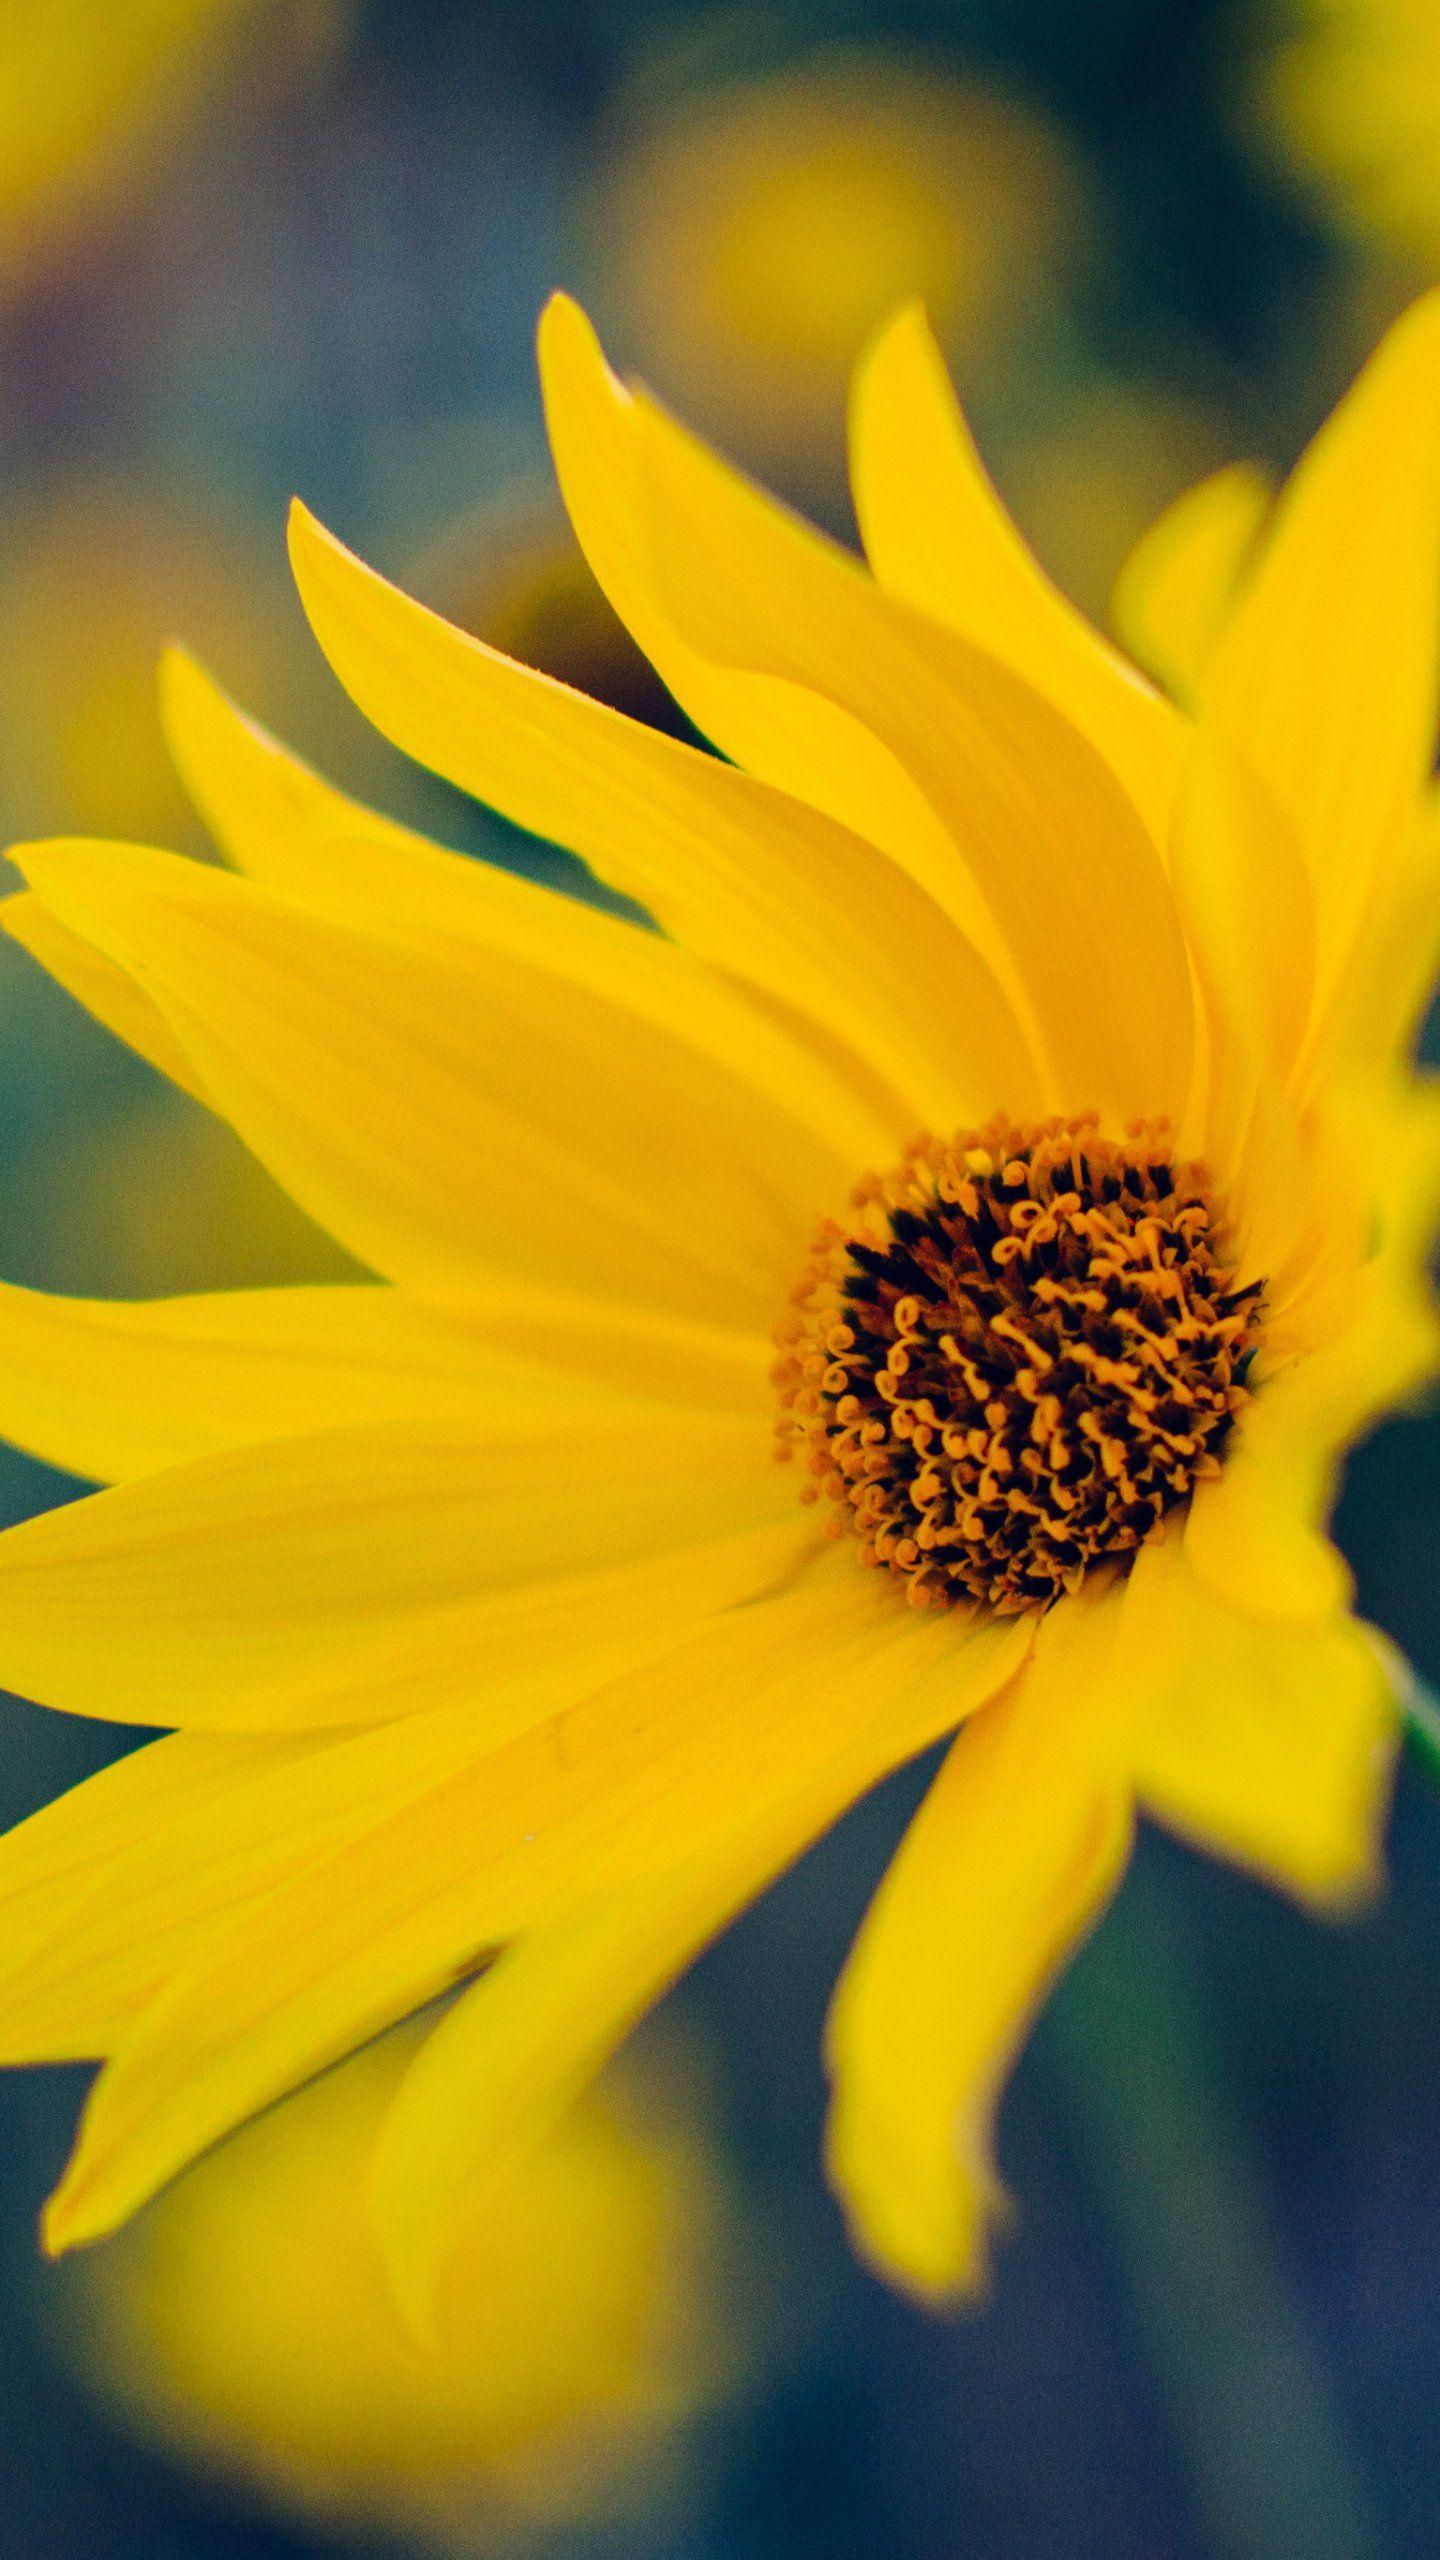 Yellow Flower Wallpaper Iphone Android Desktop Backgrounds Yellow Flower Wallpaper Flower Wallpaper Iphone Wallpaper Yellow